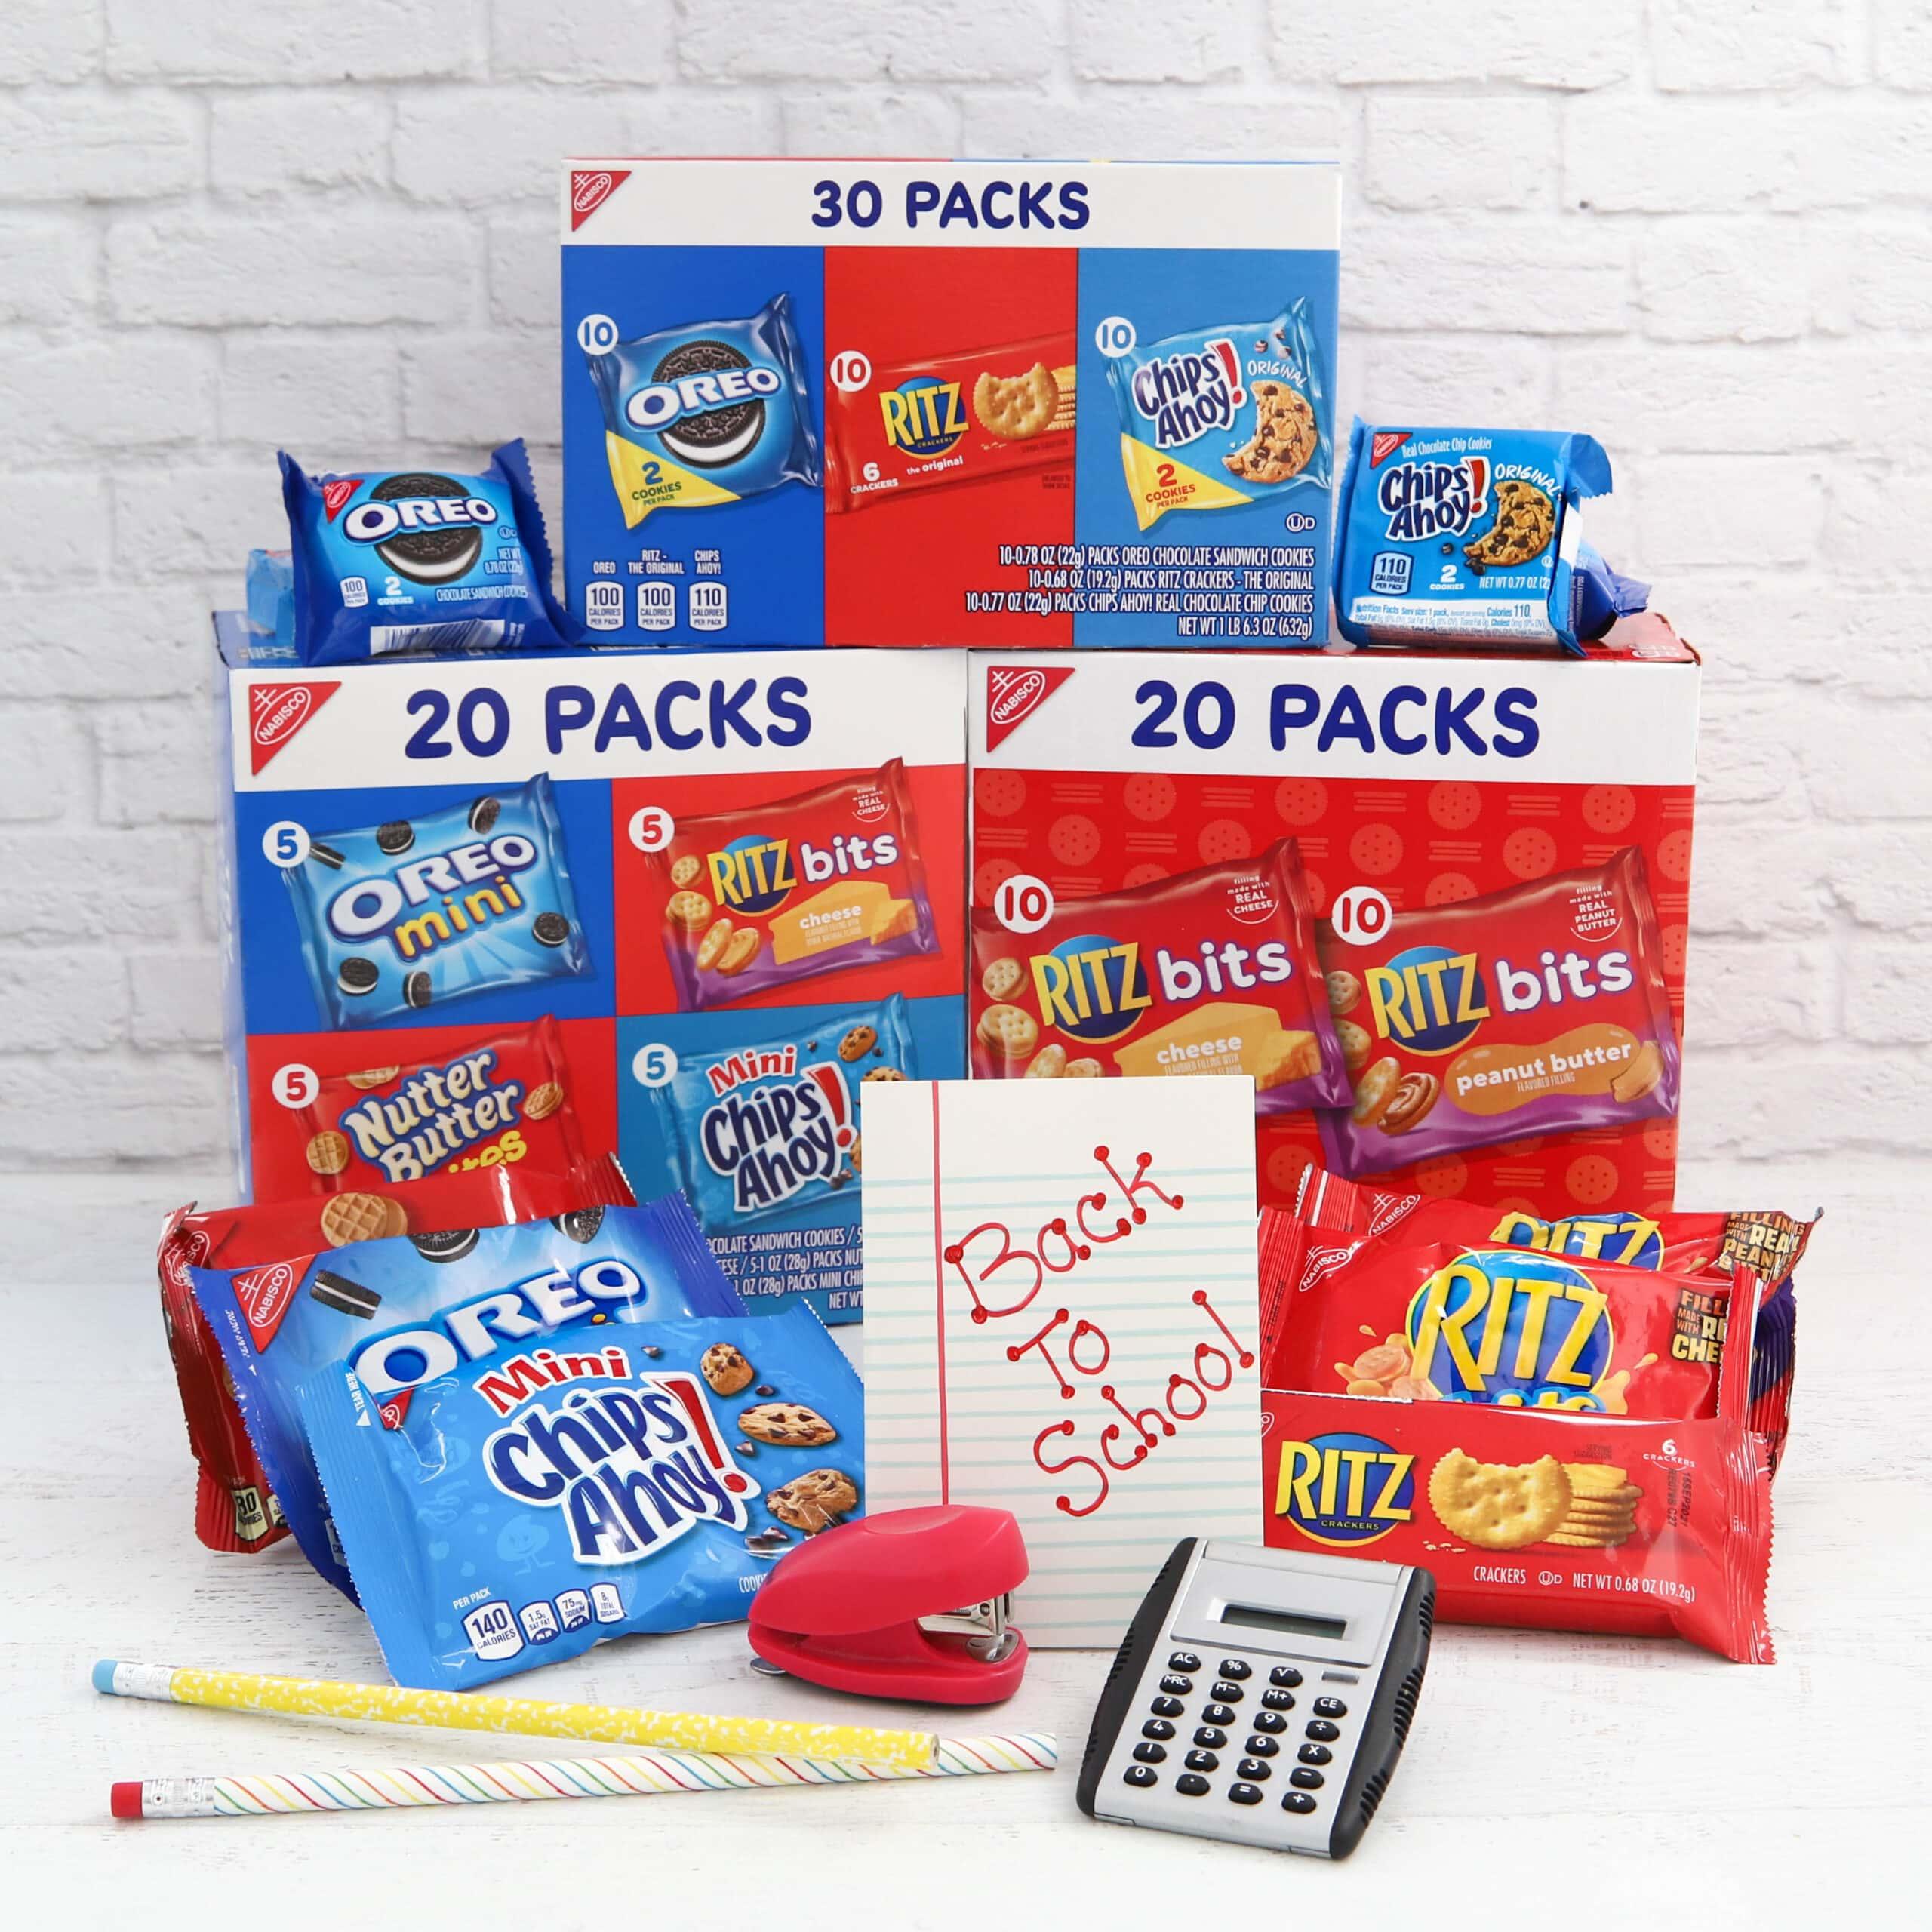 A variety of snacks in snack packs